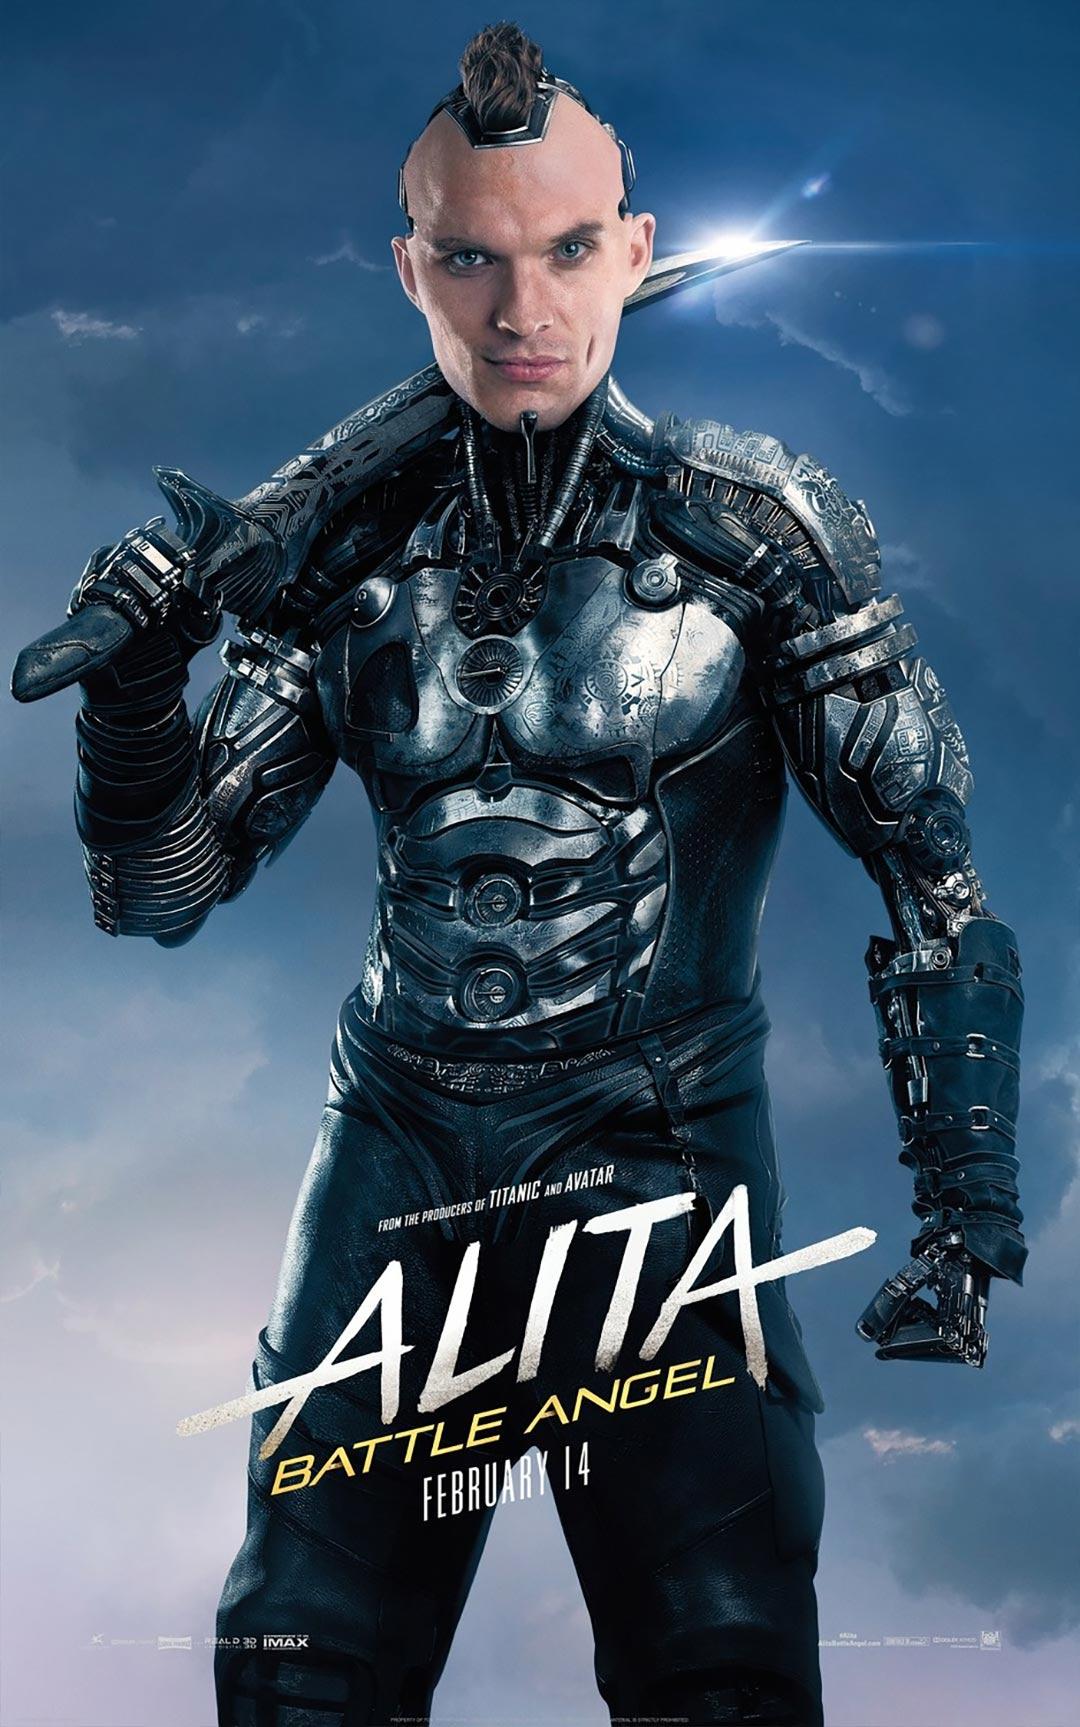 Alita: Battle Angel Poster #4